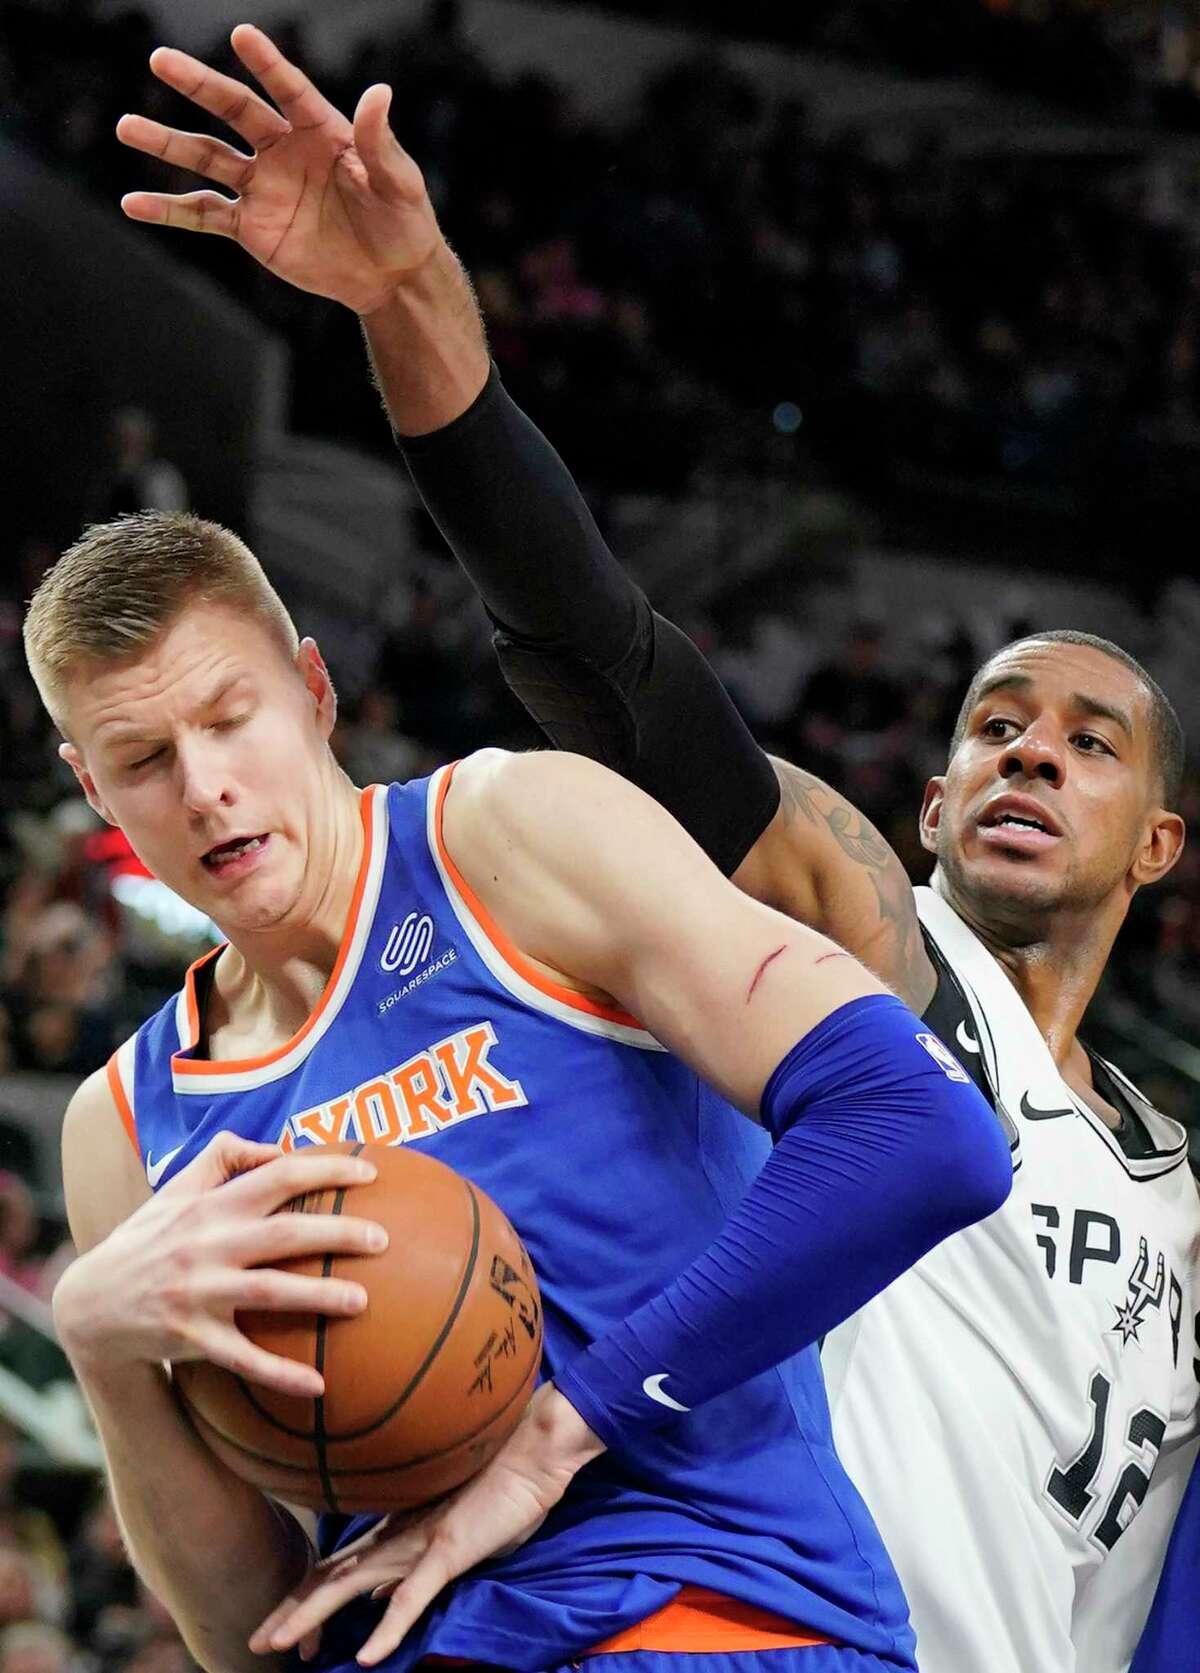 New York Knicks' Kristaps Porzingis, left, tangles with San Antonio Spurs' LaMarcus Aldridge during the second half of an NBA basketball game, Thursday, Dec. 28, 2017, in San Antonio. (AP Photo/Darren Abate)